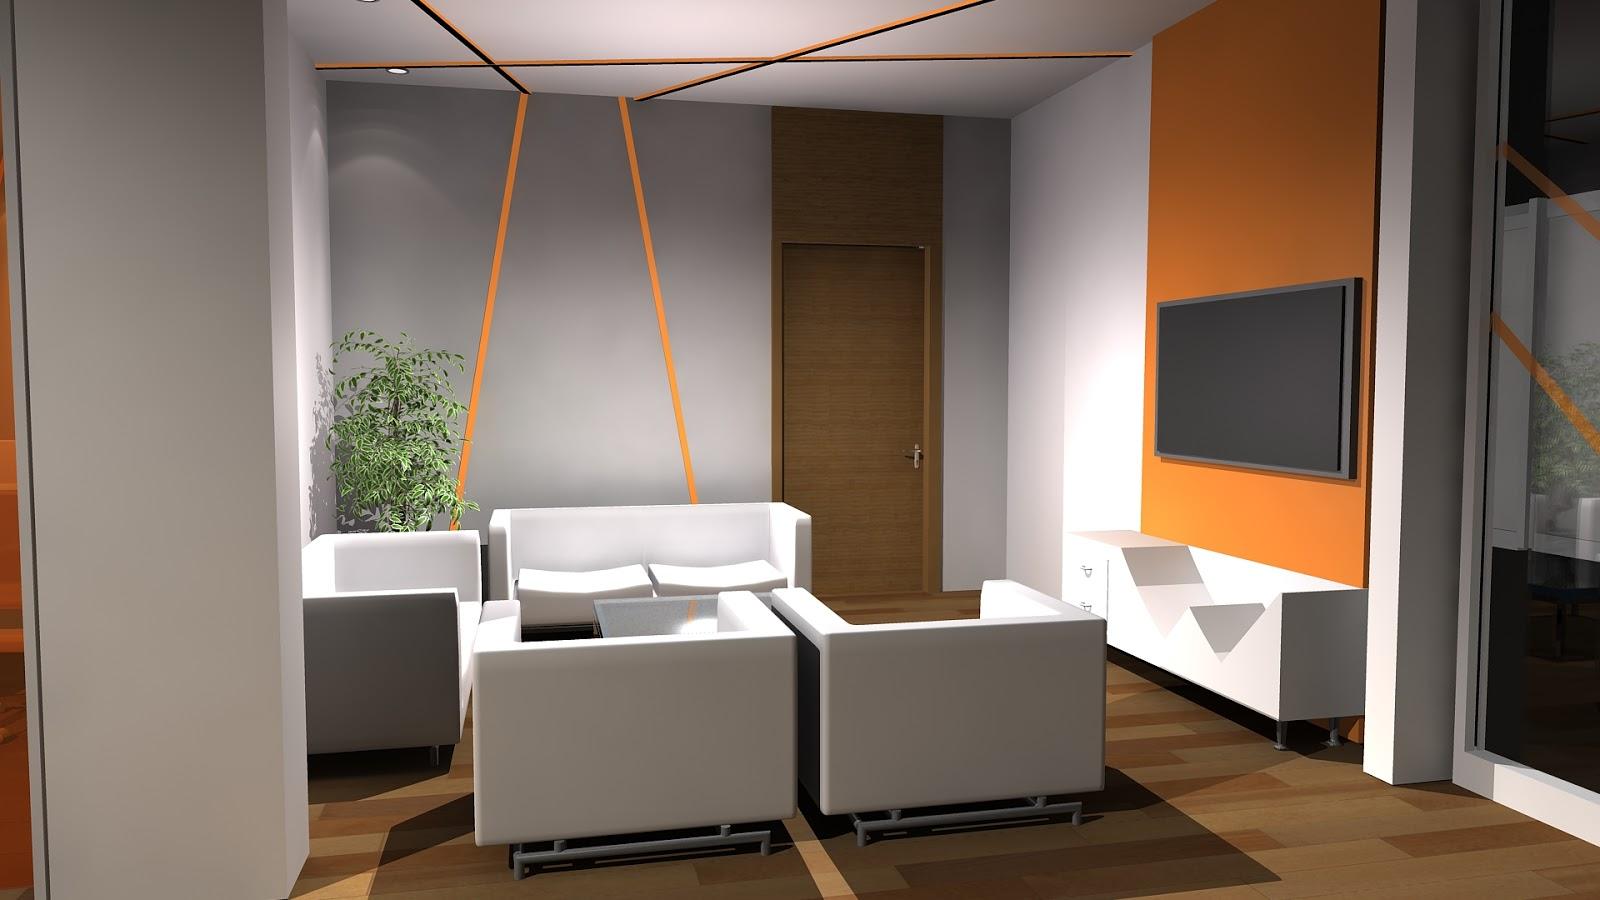 Материалы дизайн интерьера 3d